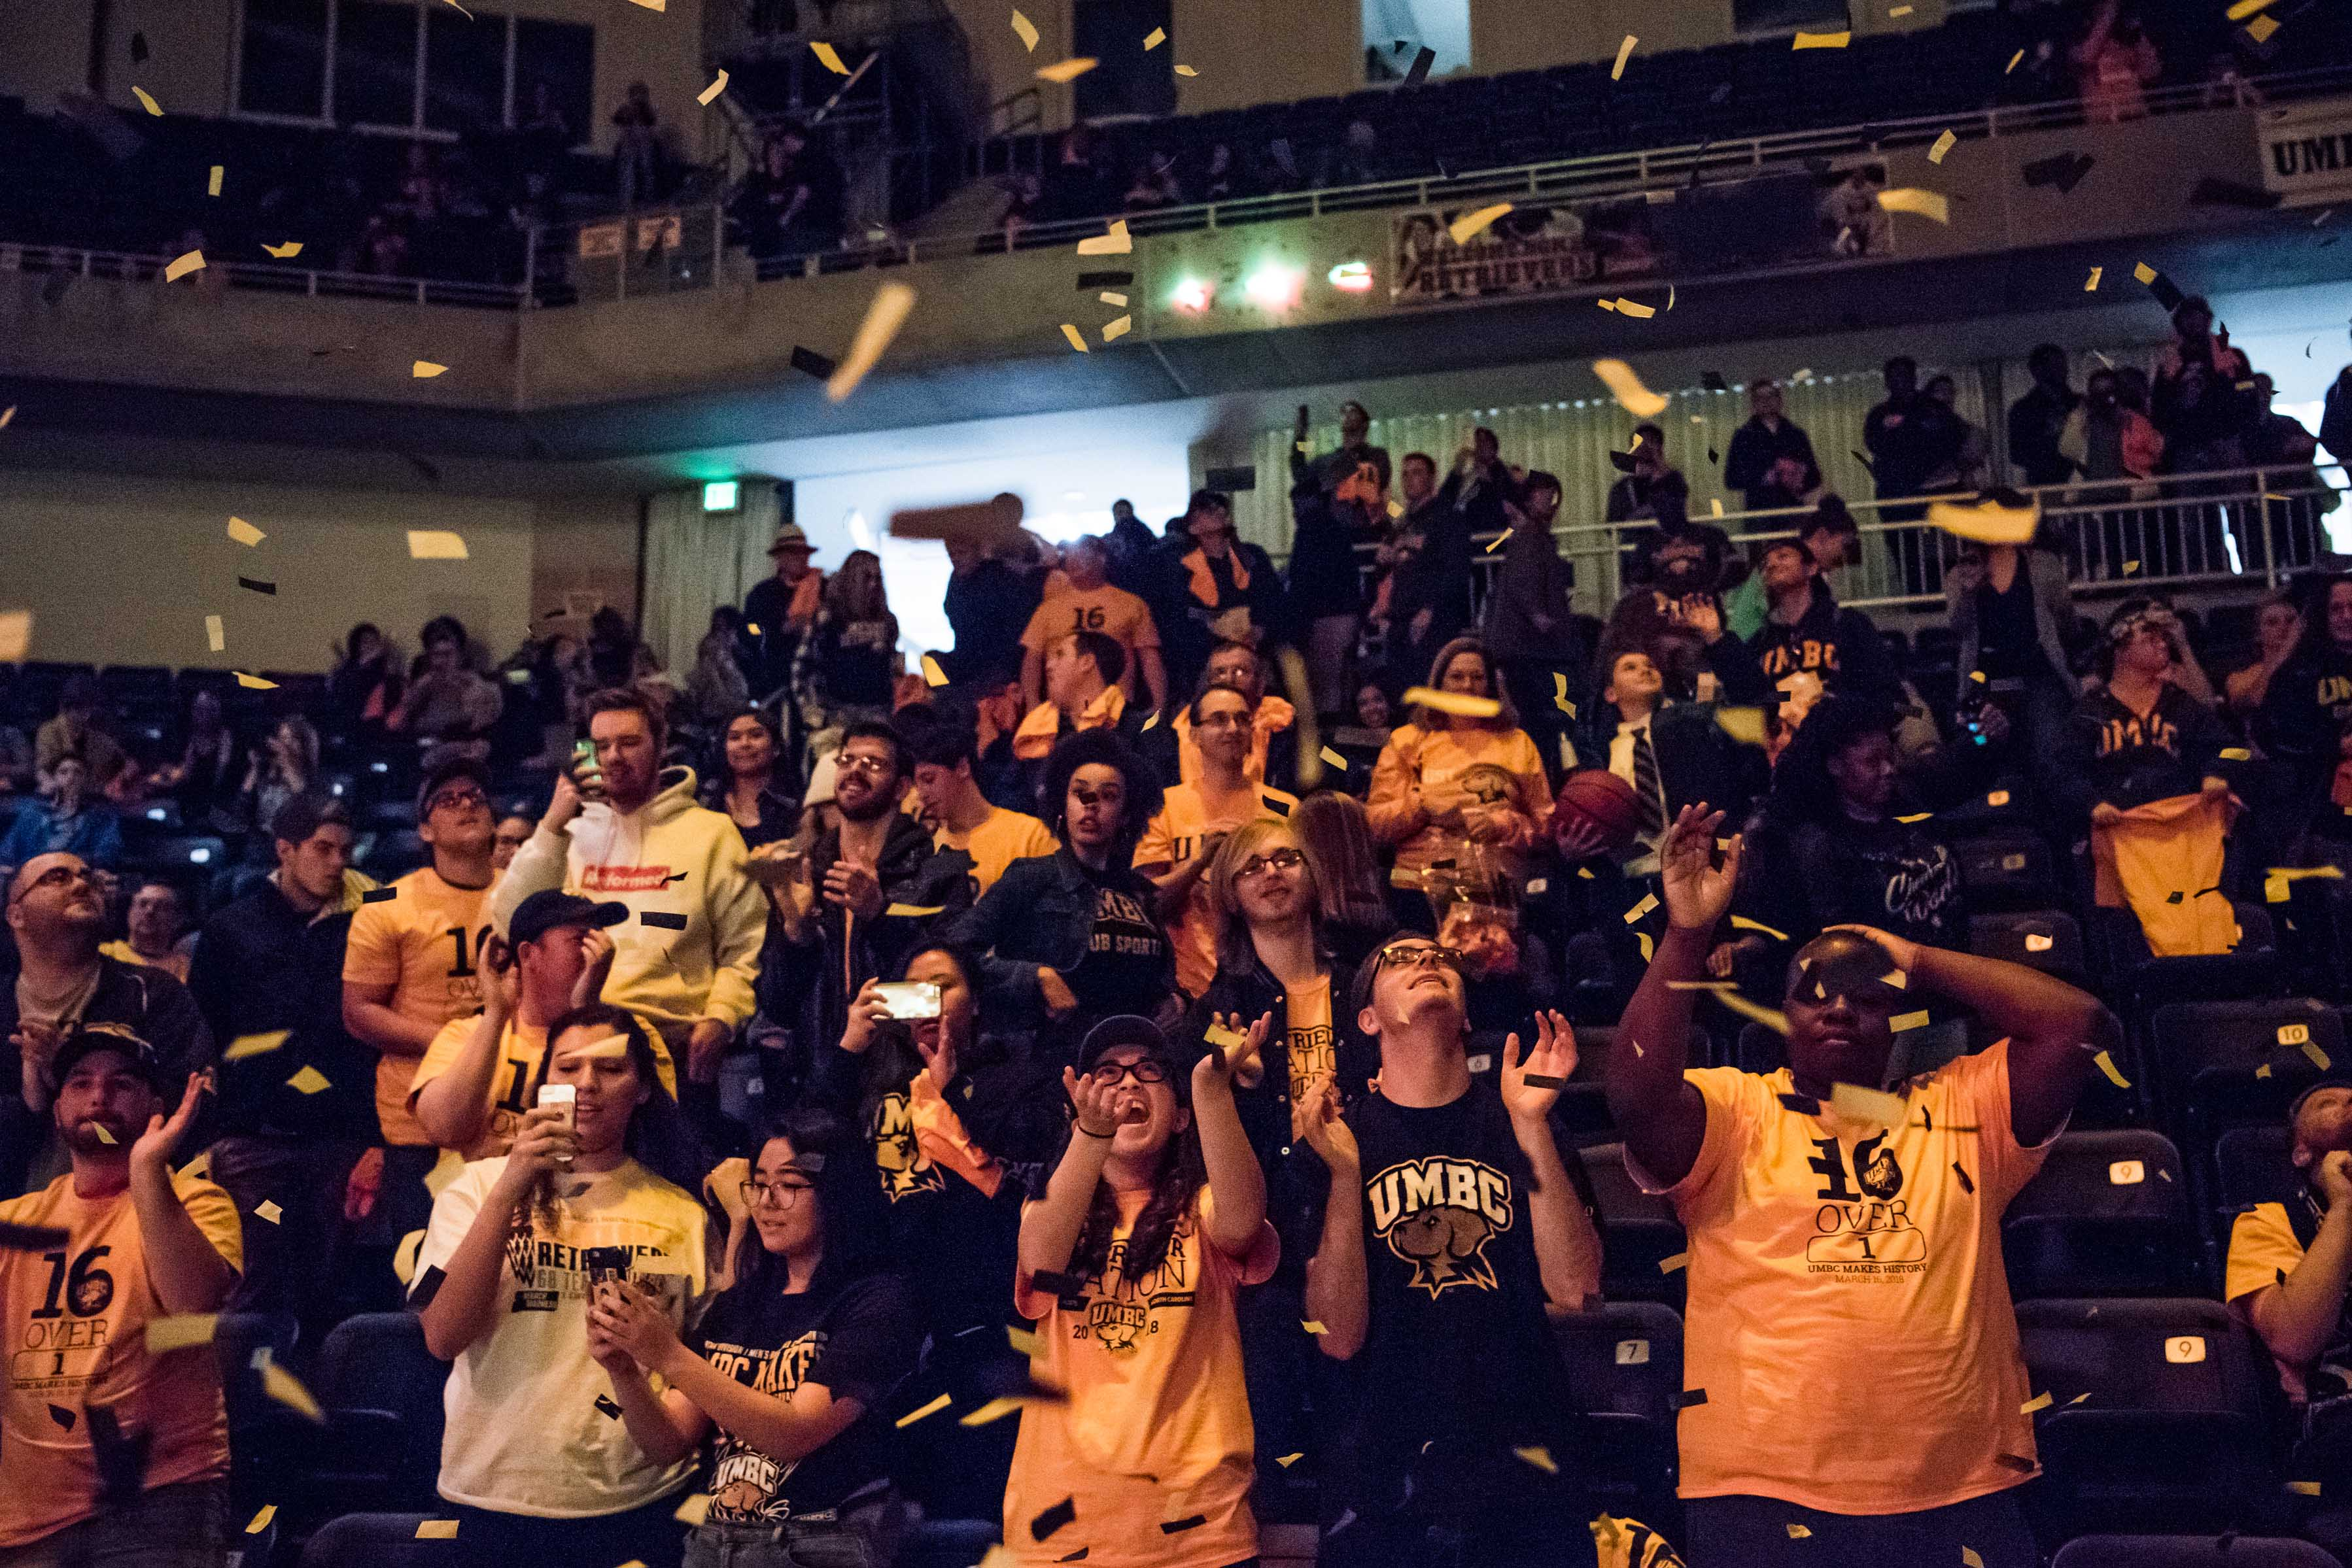 Confetti falls onto crowd at basketball celebration